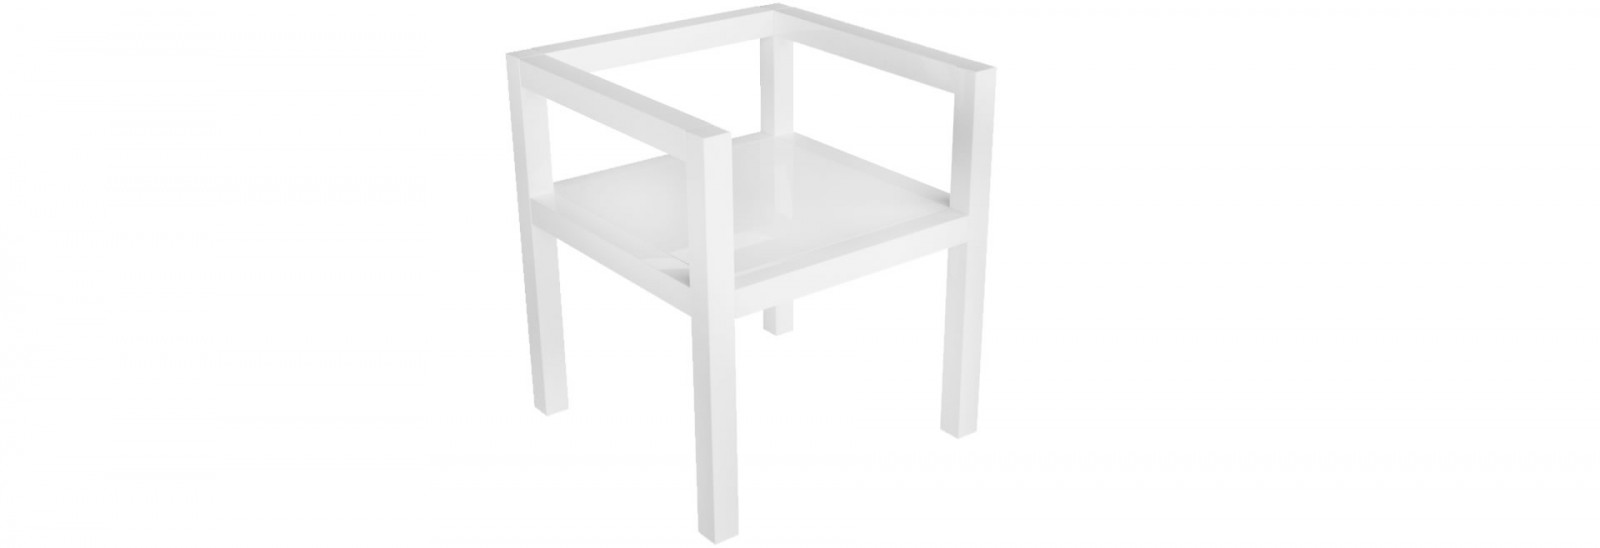 stuhl modern wei affordable discount eames chair fresh stuhl modern stuhl in hellblau modern. Black Bedroom Furniture Sets. Home Design Ideas